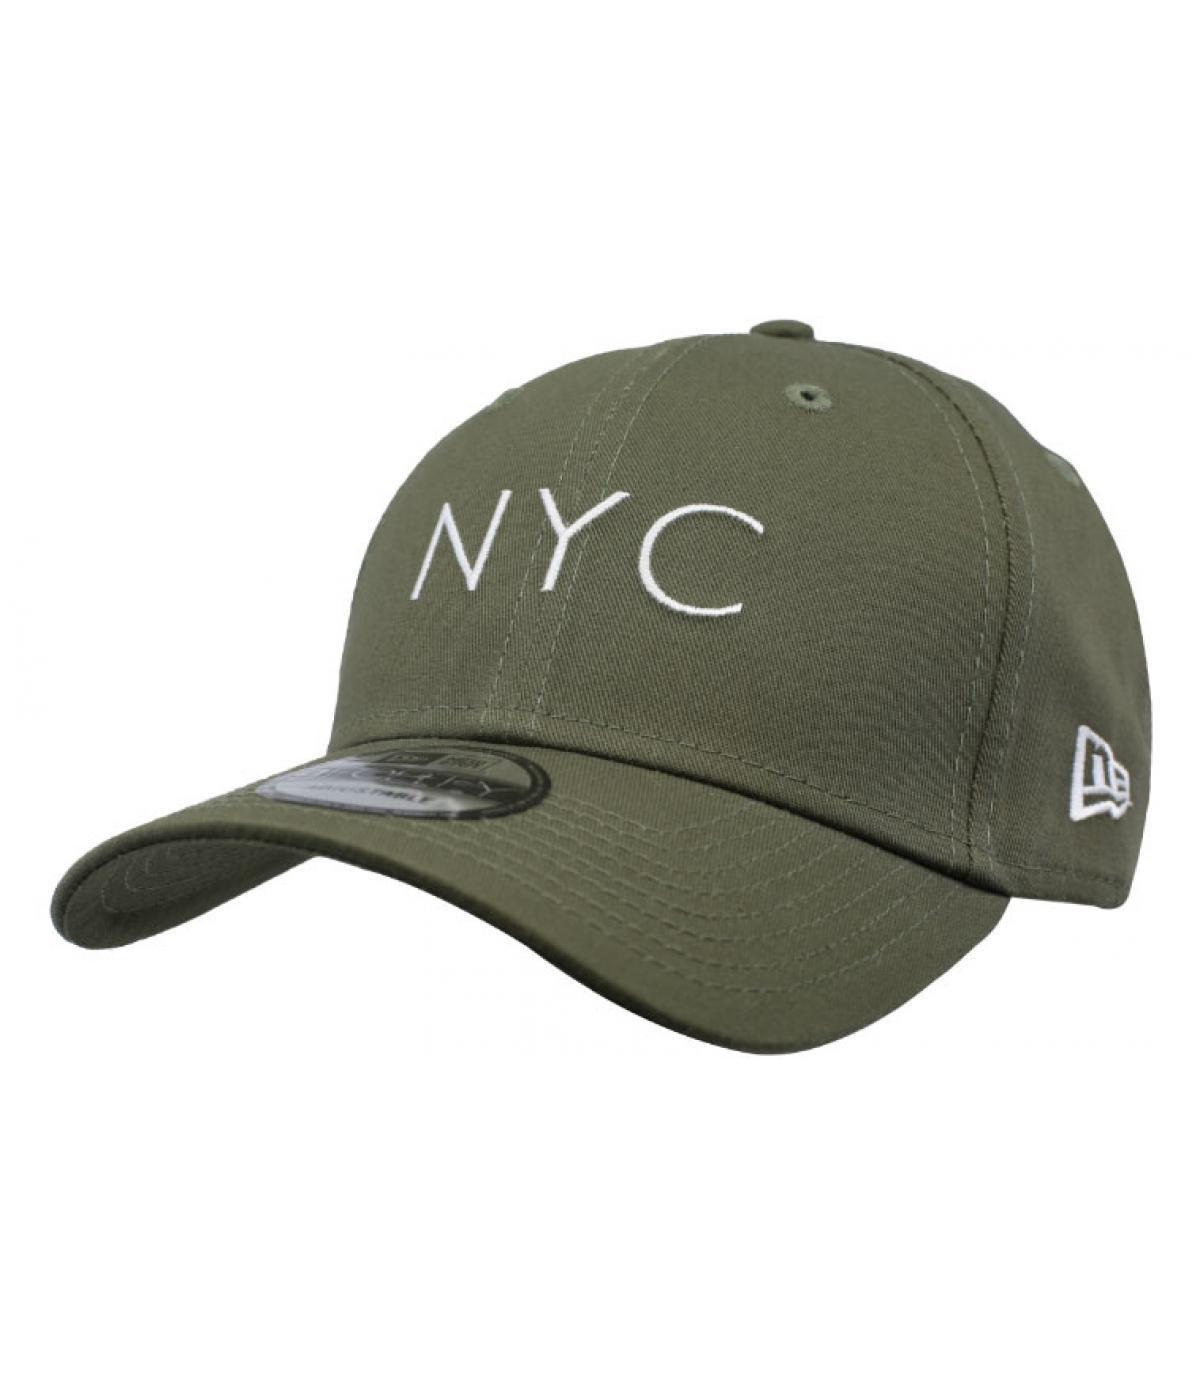 Details Cap NYC NE Ess 9Forty olive - Abbildung 2